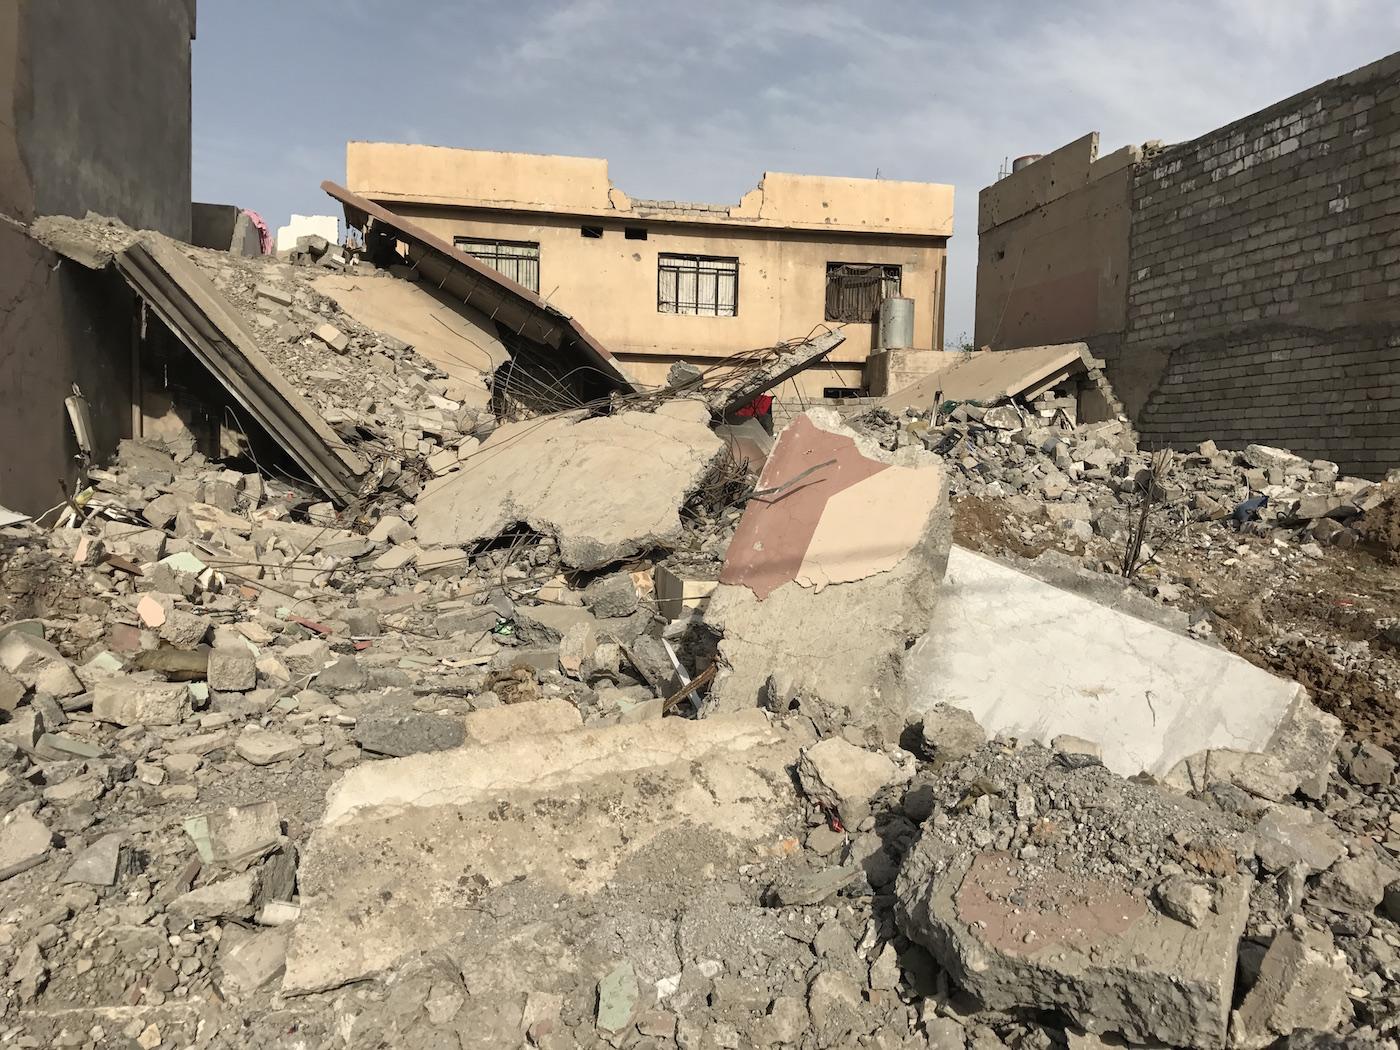 पूर्वी मोसुल के अल-सलाम इलाके में पूरी तरह मलबा बन चुकी एक इमारत. फोटो क्रेडिट : सुप्रिया शर्मा